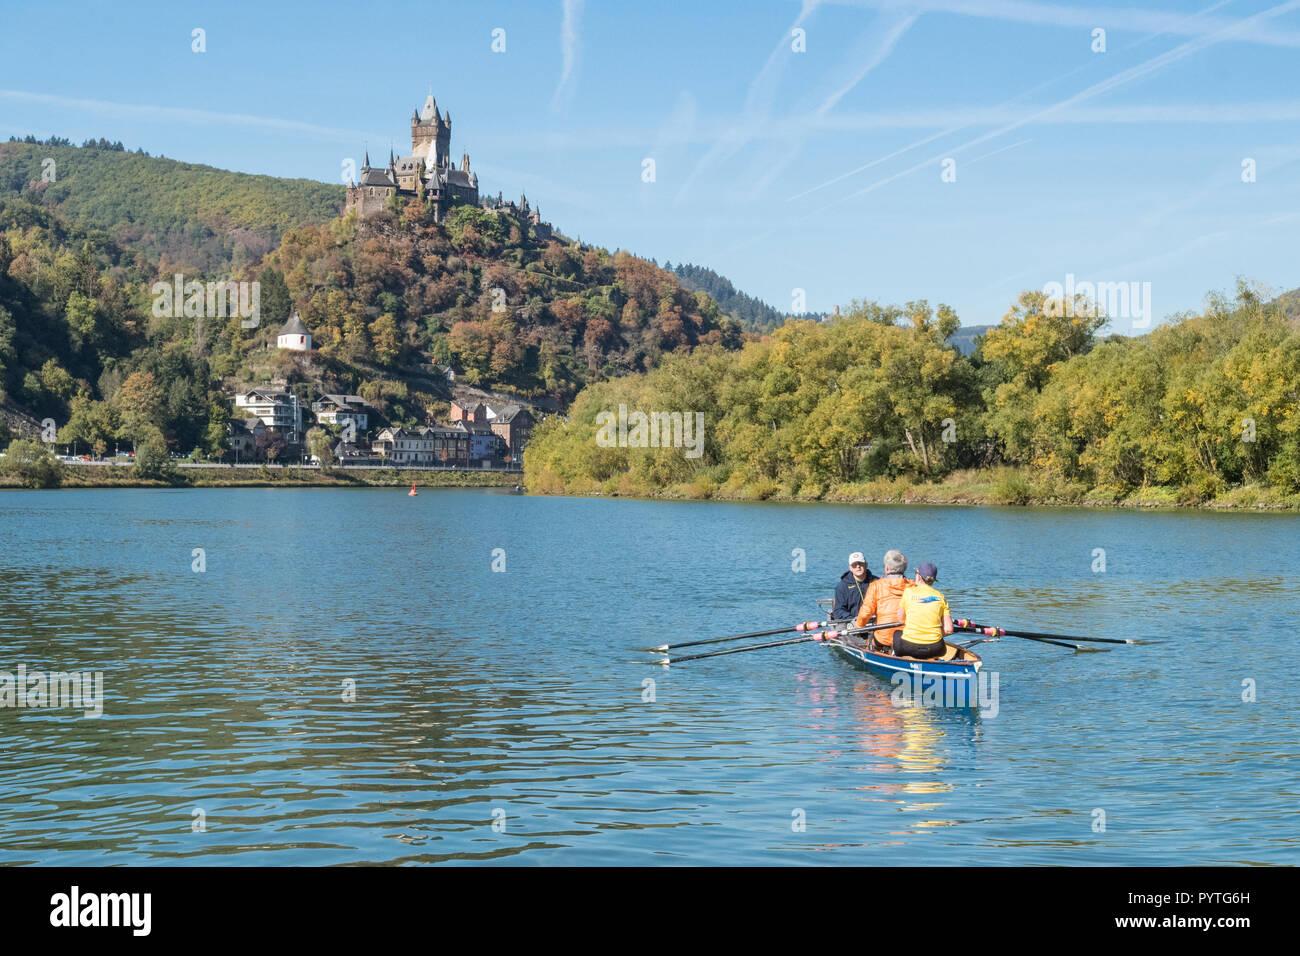 Cochem, Cochem-Zell, hineland-Palatinate, Germany - Canoeing on the Moselle river - Stock Image